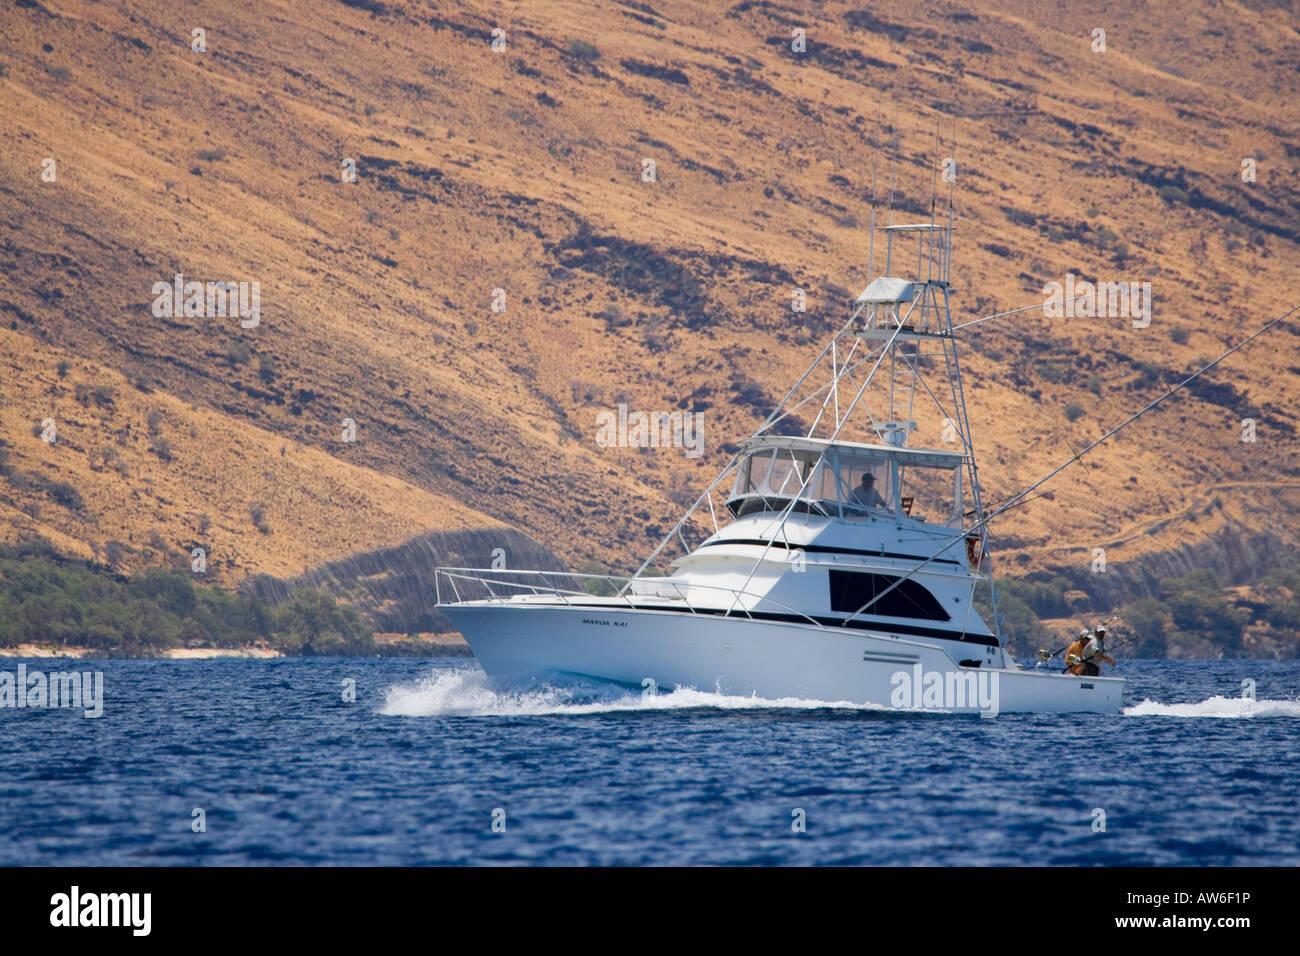 A sportfishing boat cruises the waters off Maui, Hawaii. Stock Photo